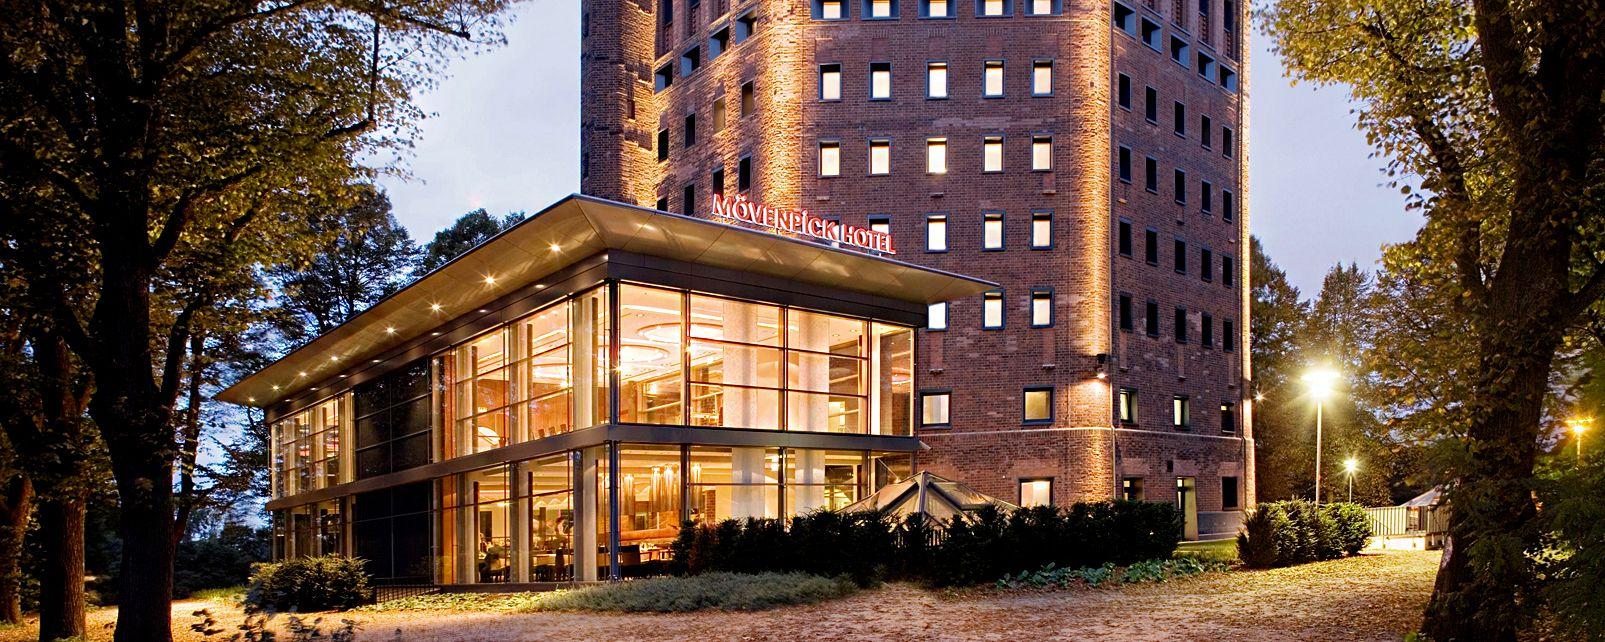 Hotel Mövenpick Hotel Hamburg